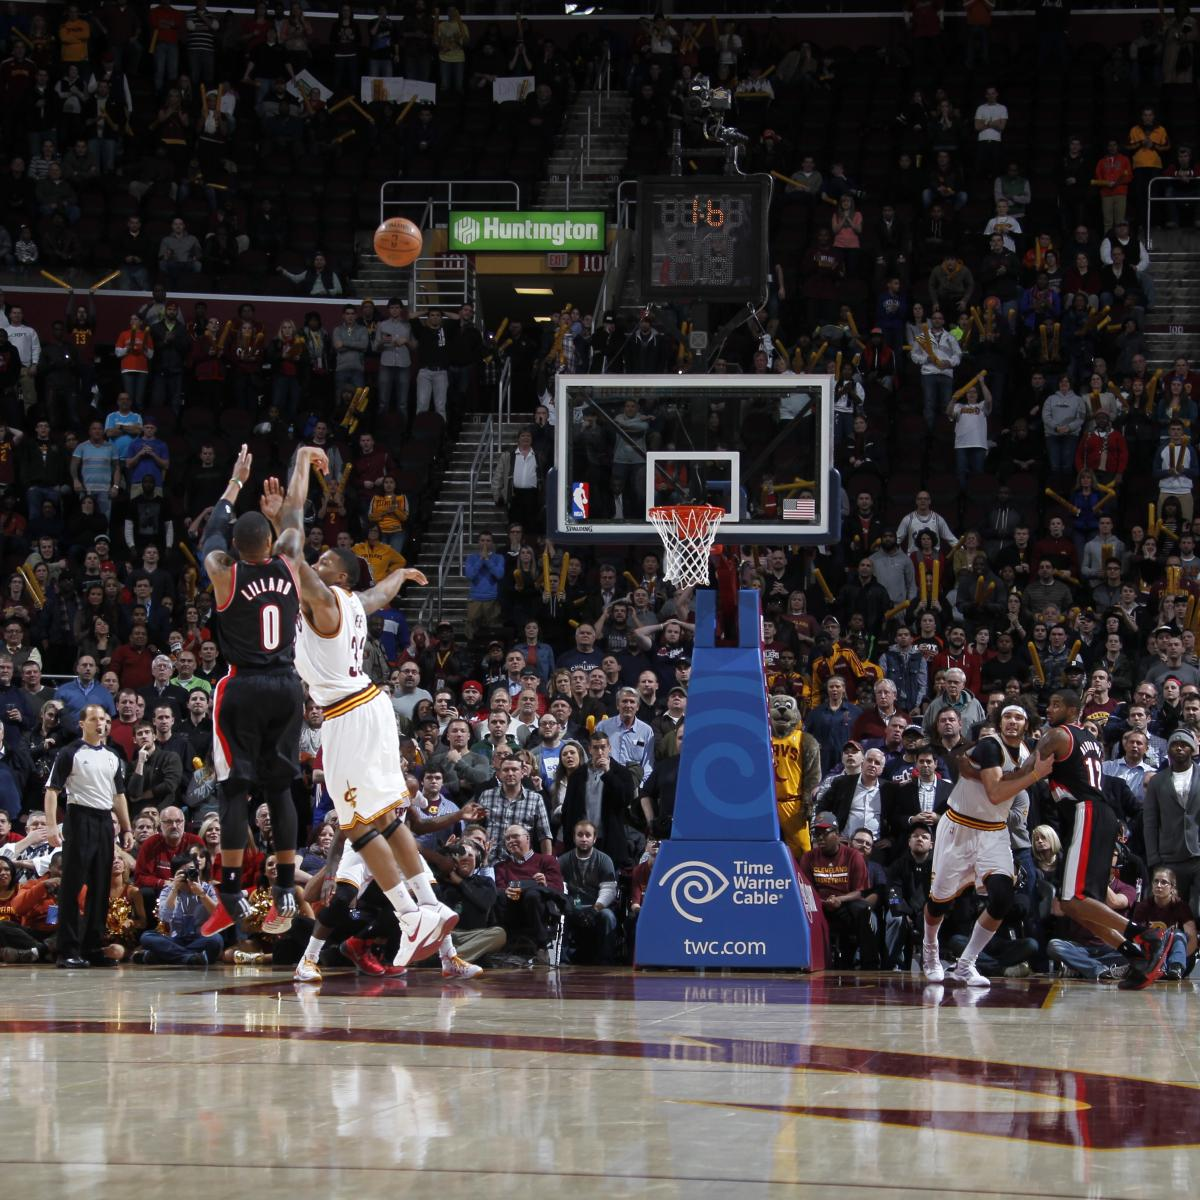 Portland Blazers Game Score: Portland Trail Blazers' Ridiculously Hot 3-Point Shooting